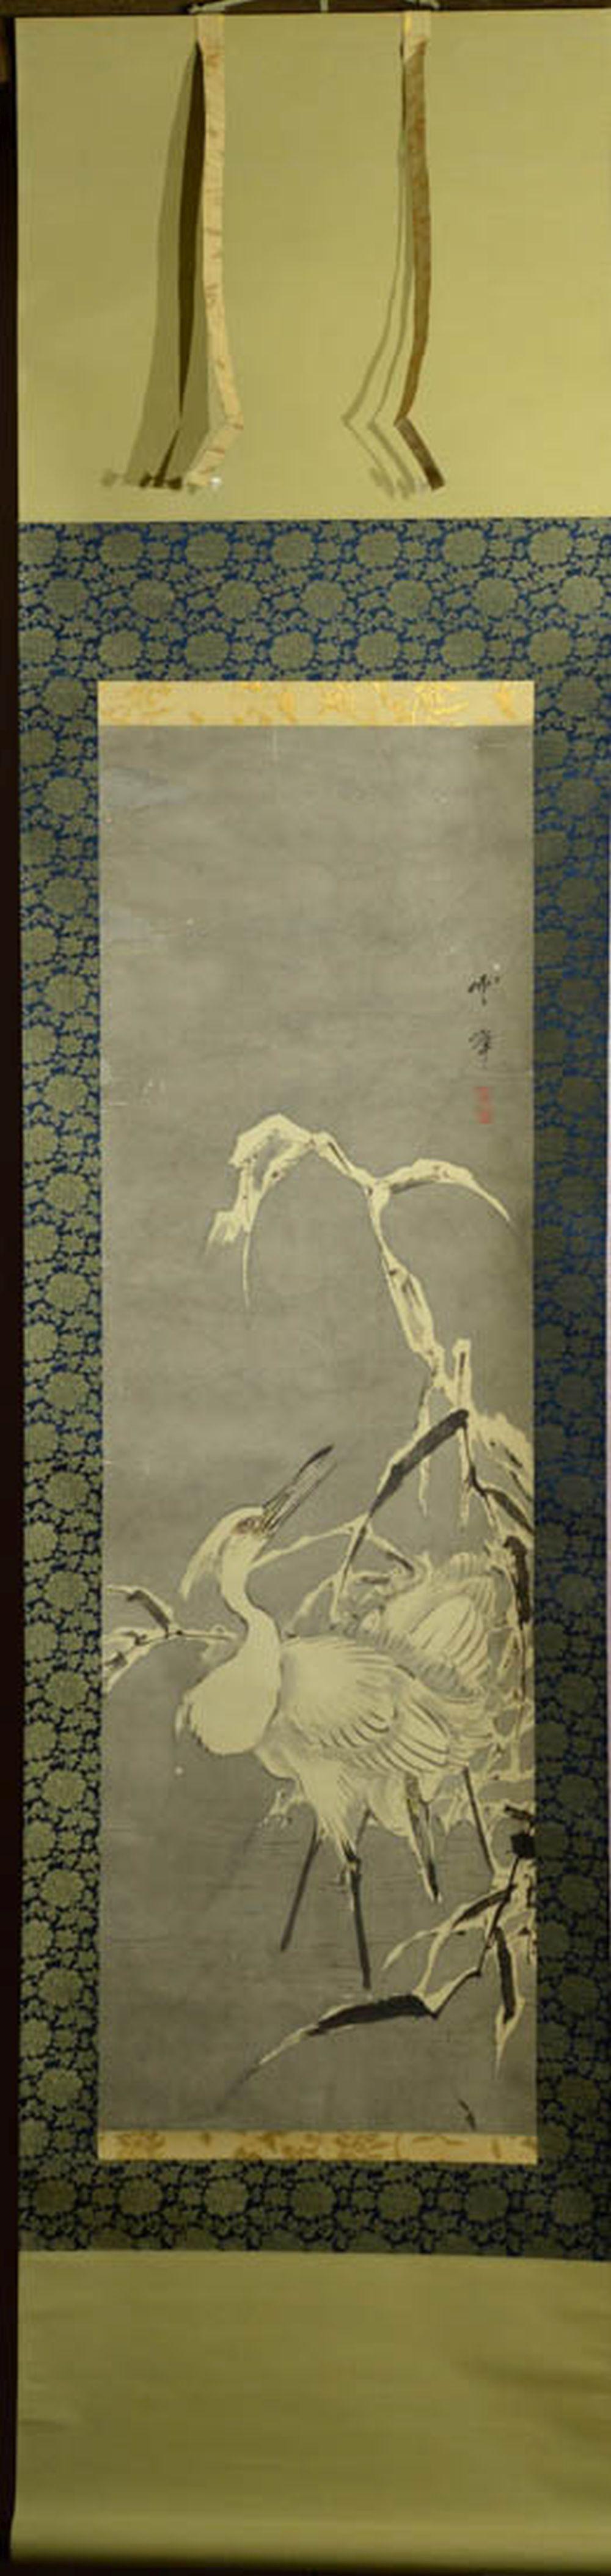 Japanese Water Color Scroll Painting - heron